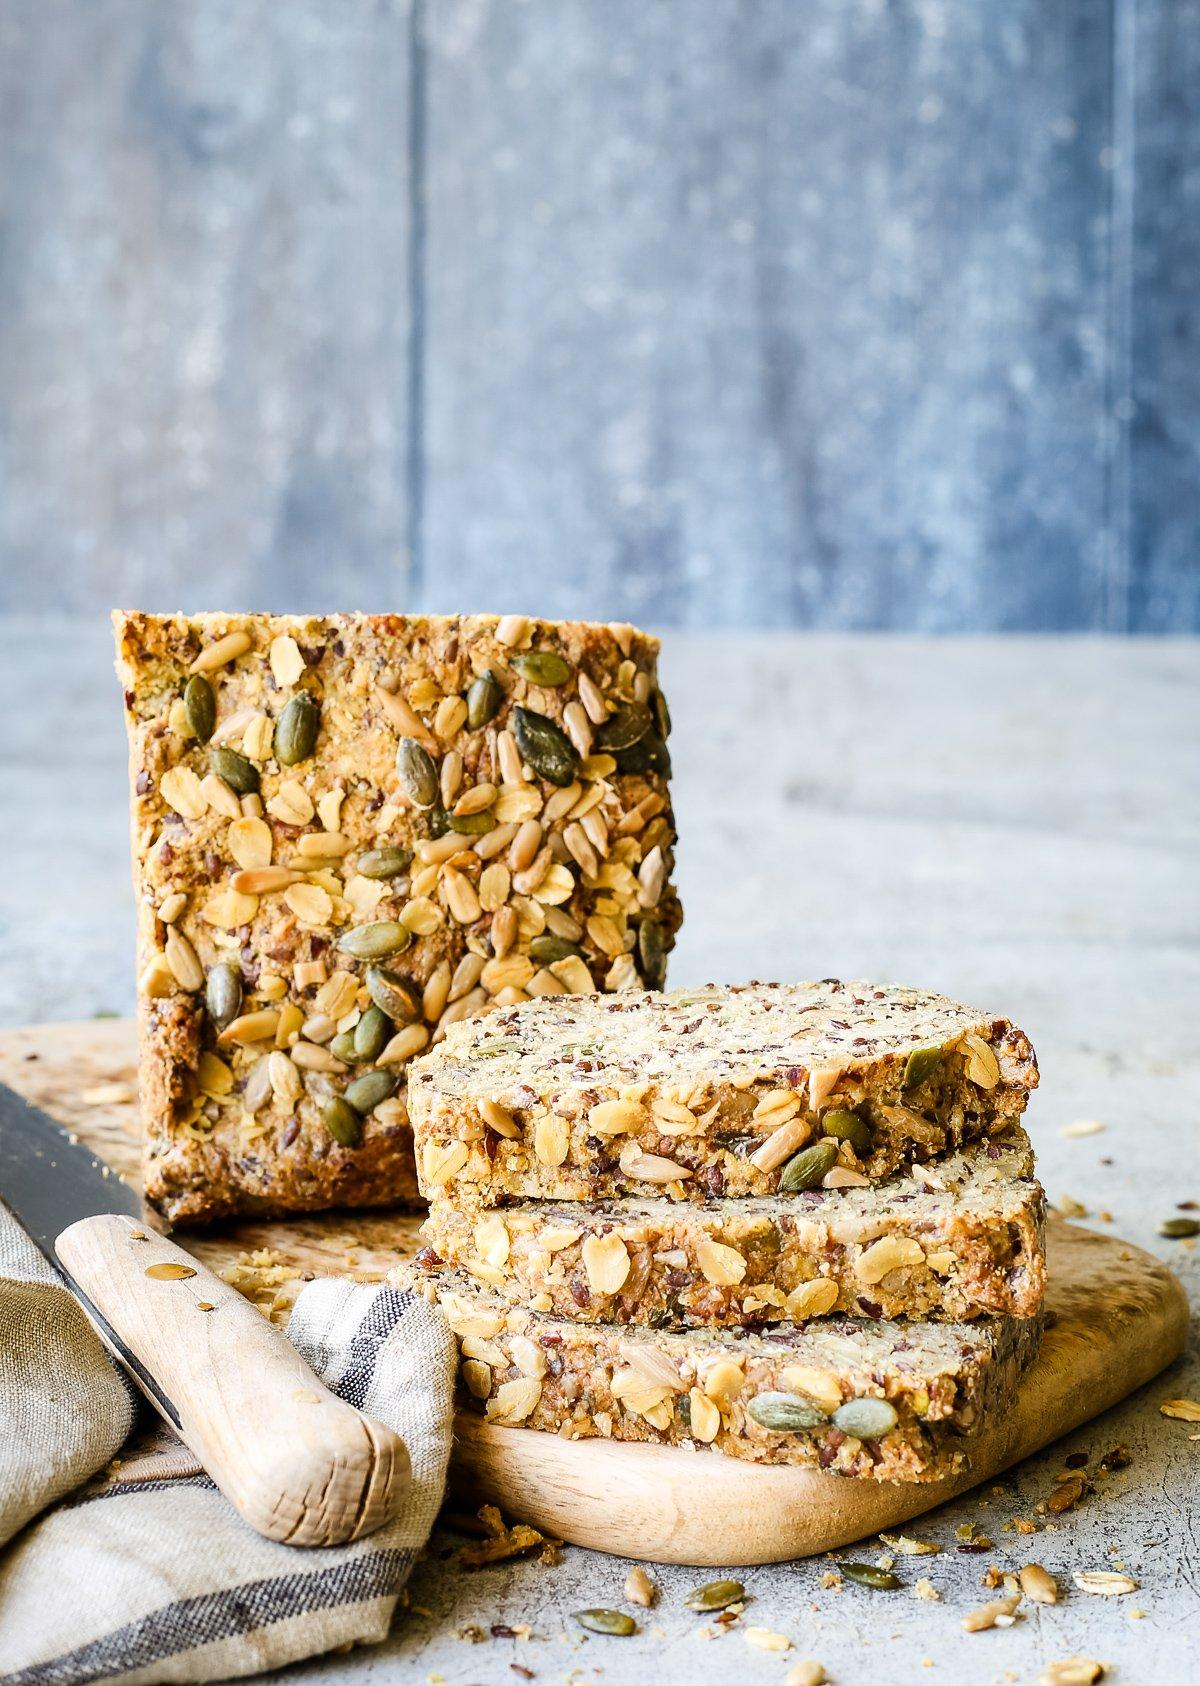 glutenfreies Thermomix Brot ohne Hefe